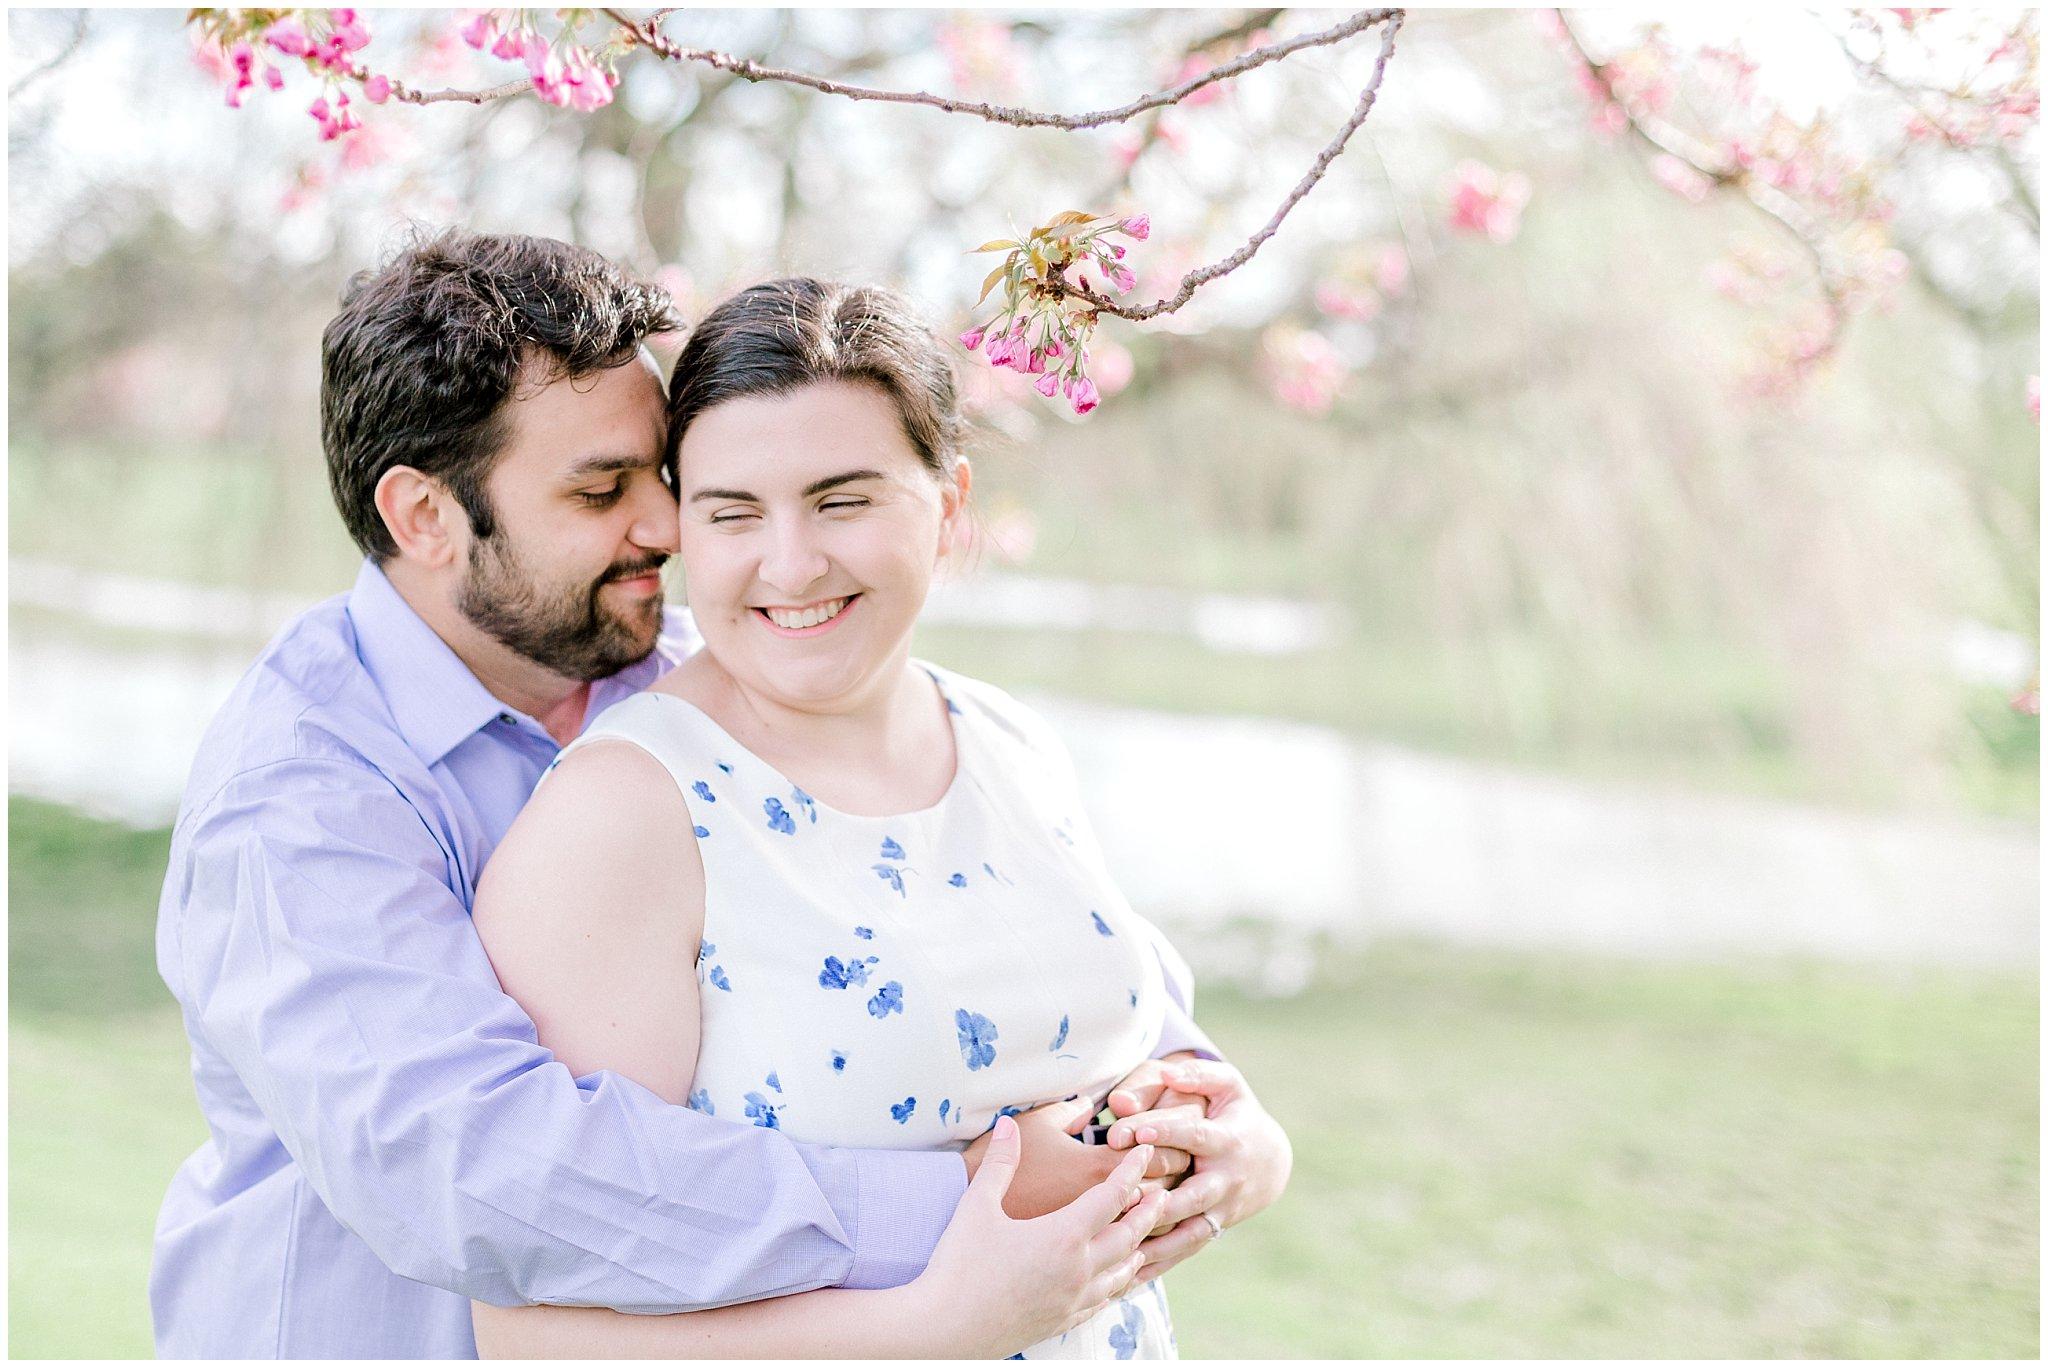 Lehigh Valley Spring Cherry Blossom Engagement Session Pennsylvania Wedding Photographer (9).jpg